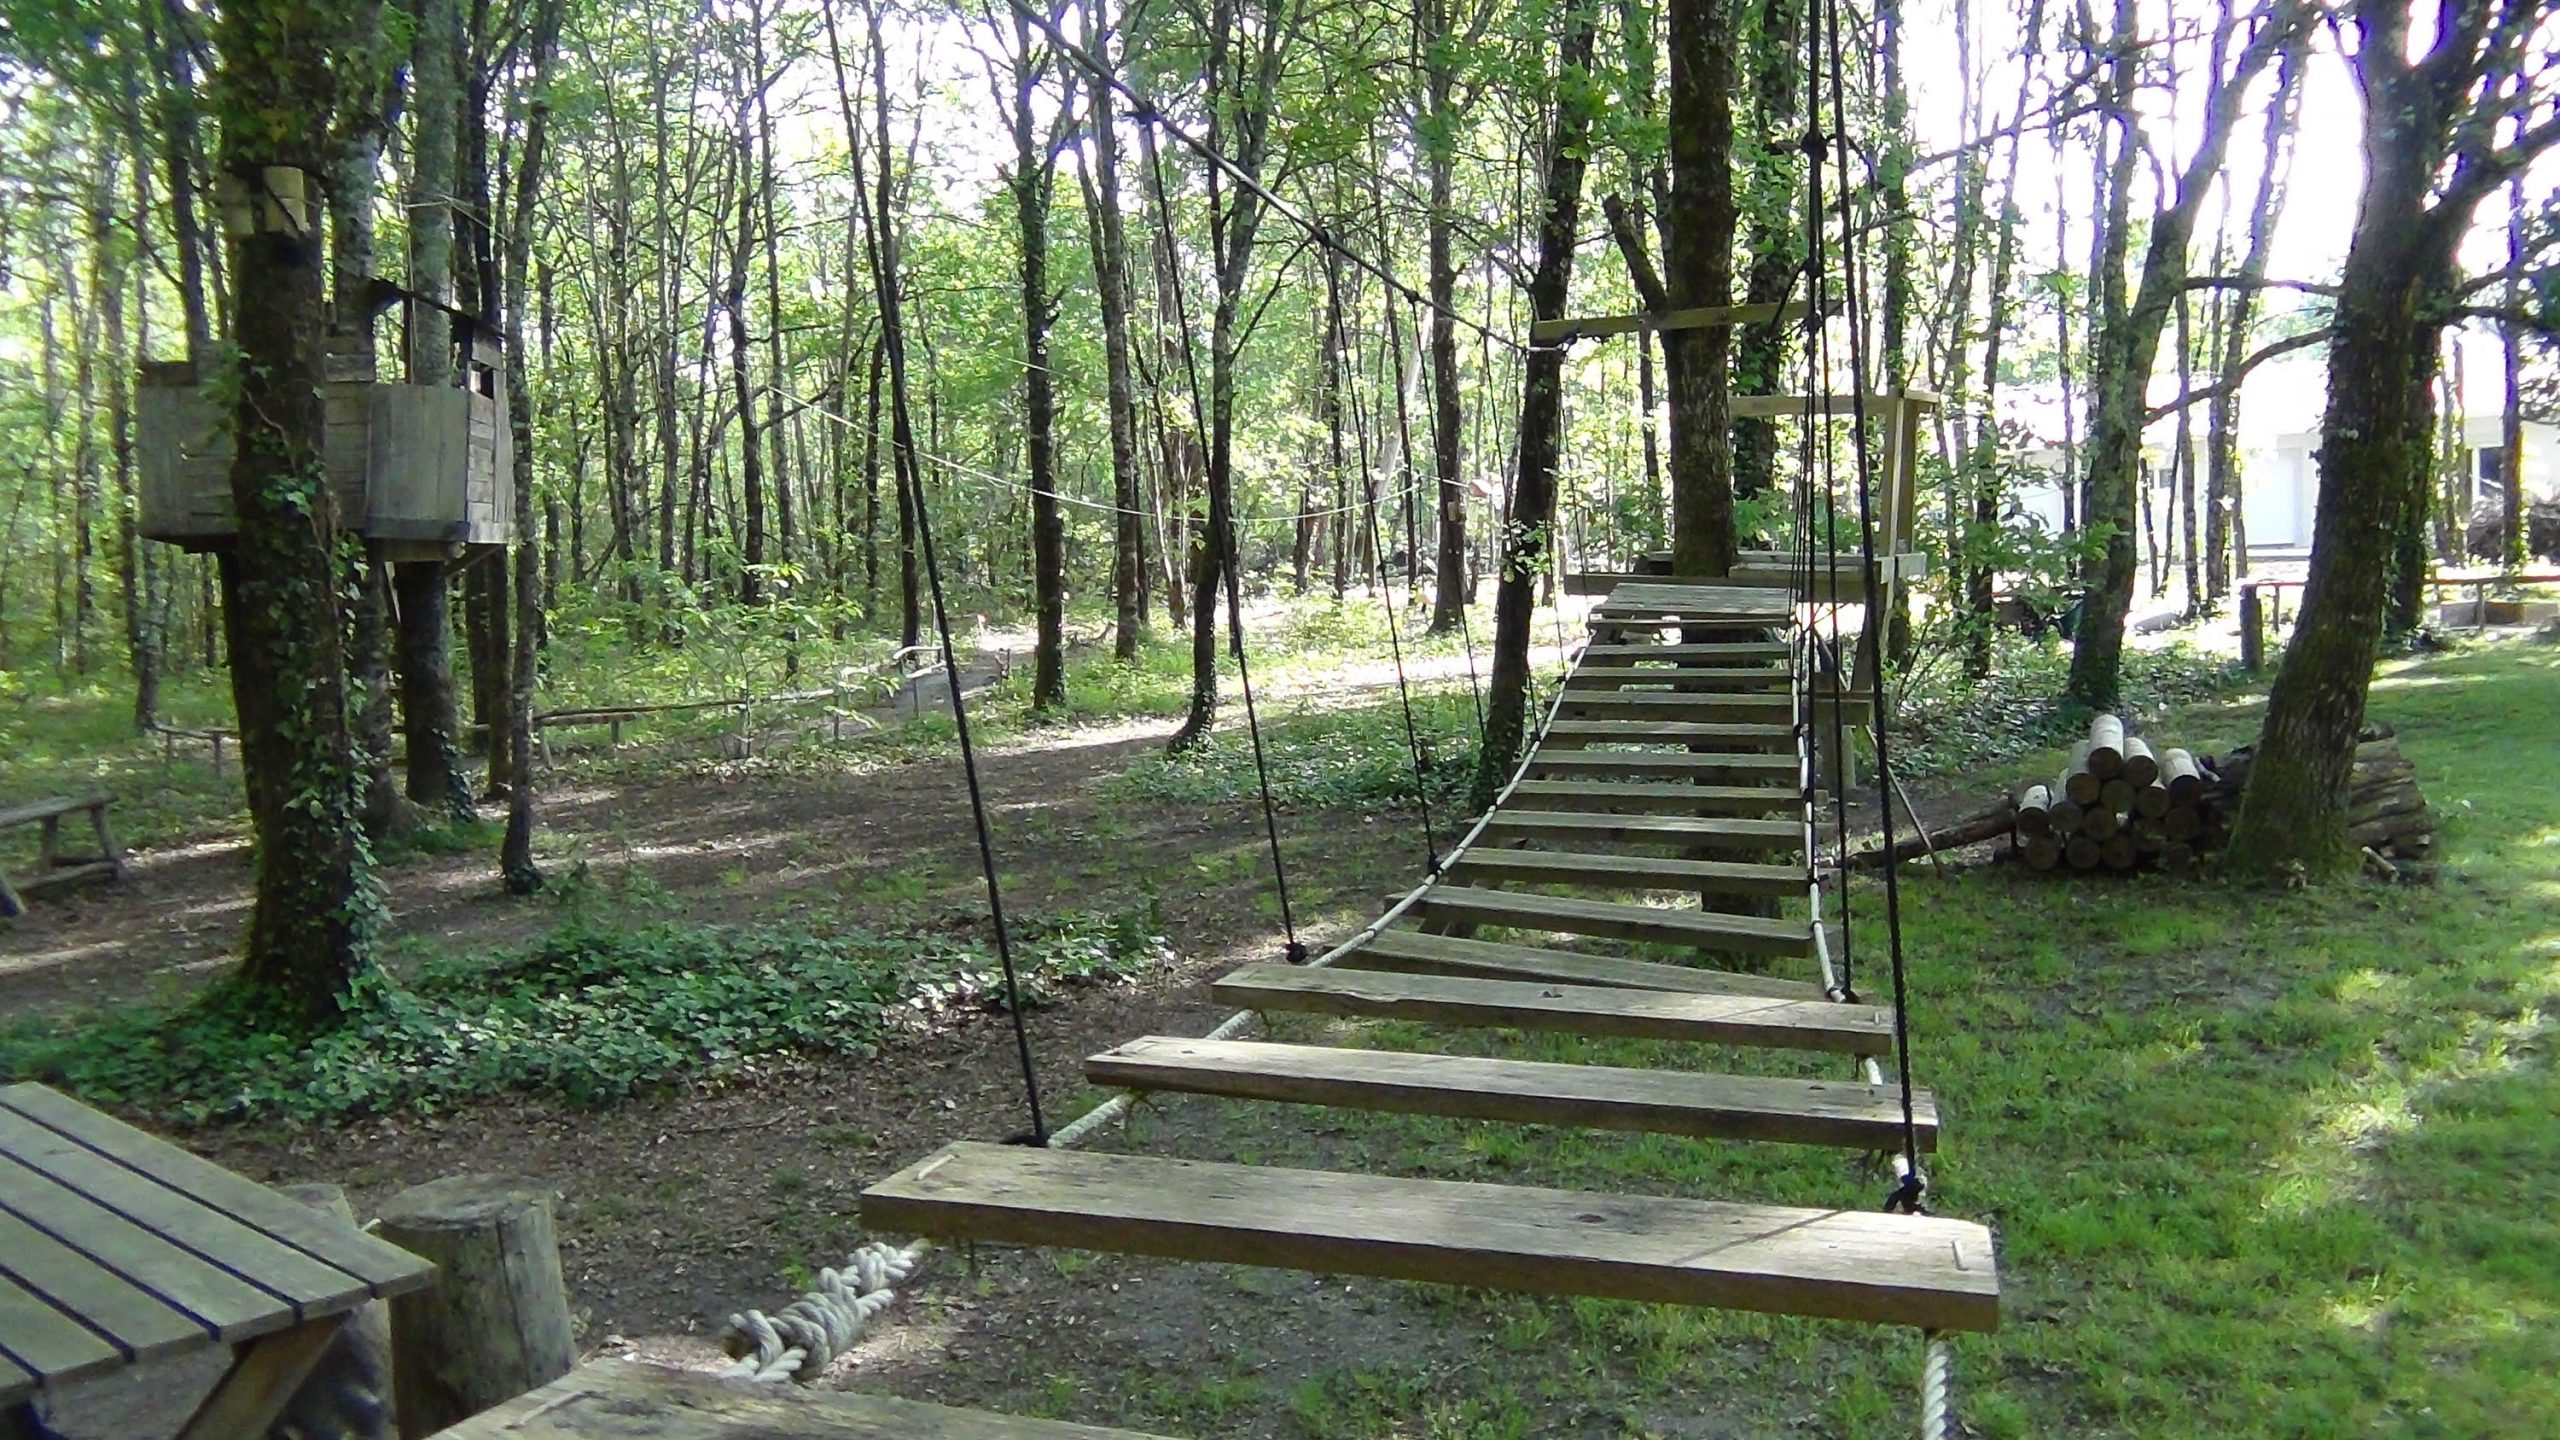 Mon Acrobranche Maison - Communauté Leroy Merlin destiné Tyrolienne Jardin Leroy Merlin